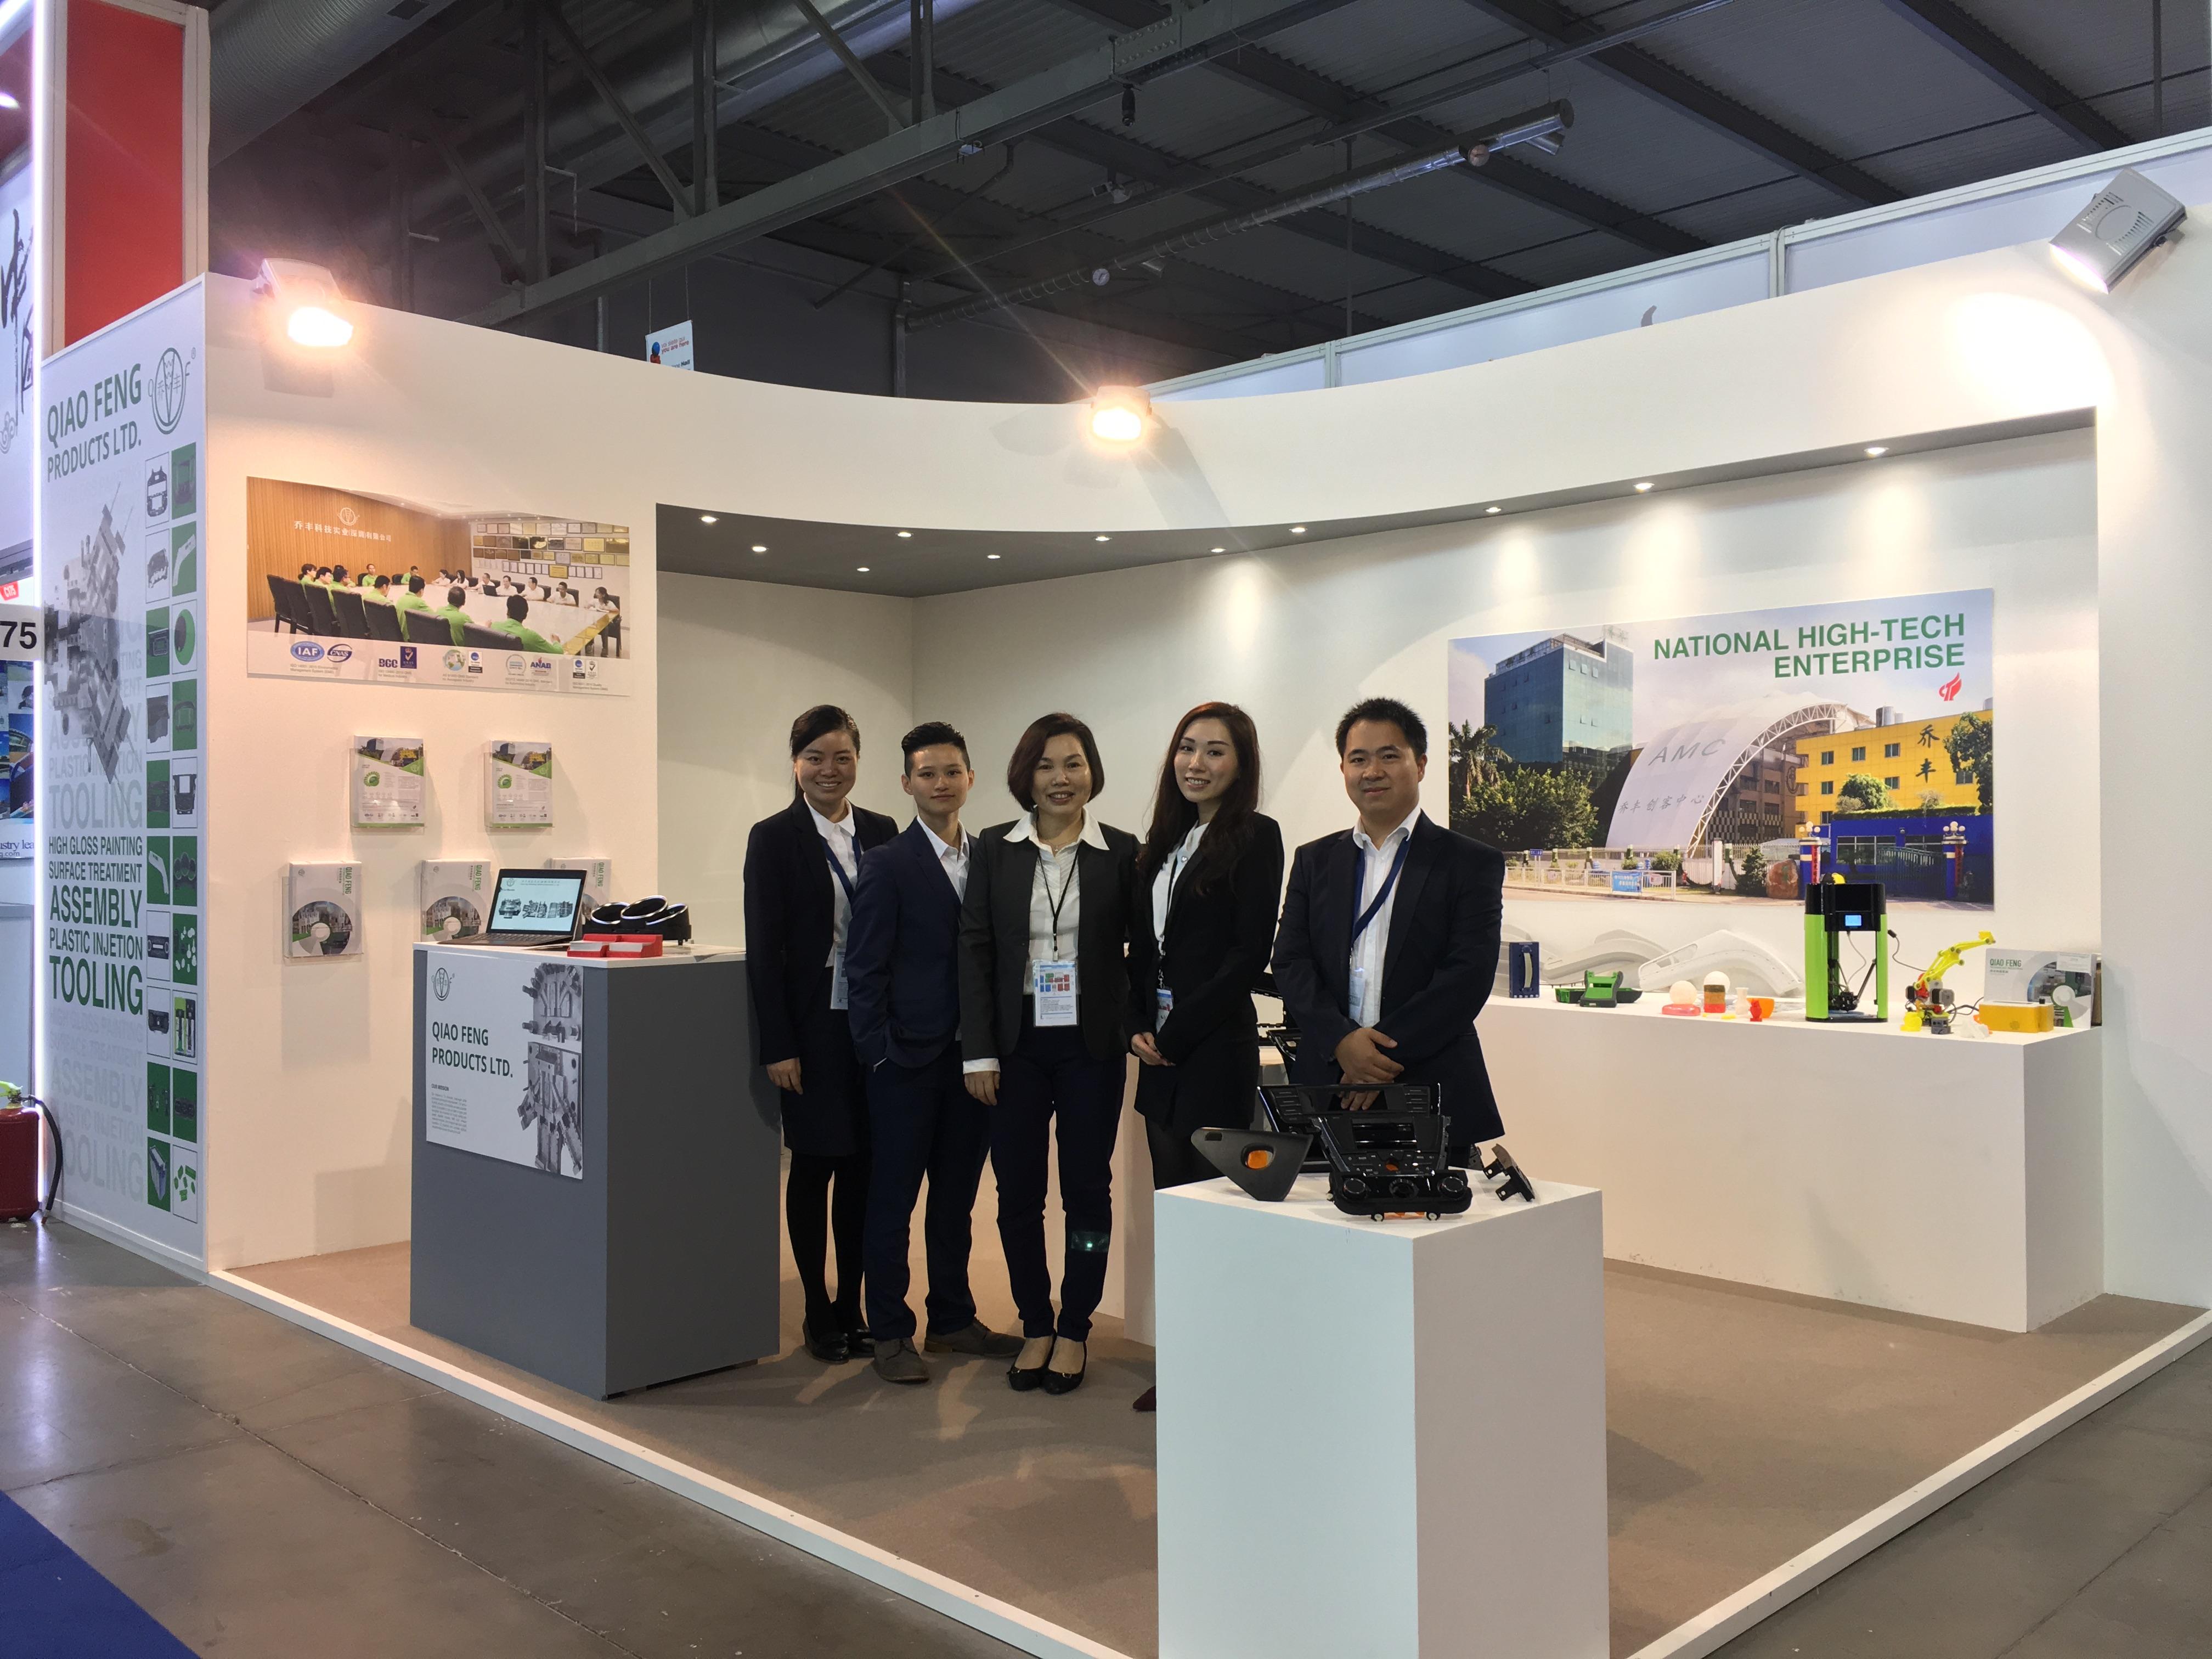 Qiao Feng Technology Industrial (Shenzhen) Co , Ltd